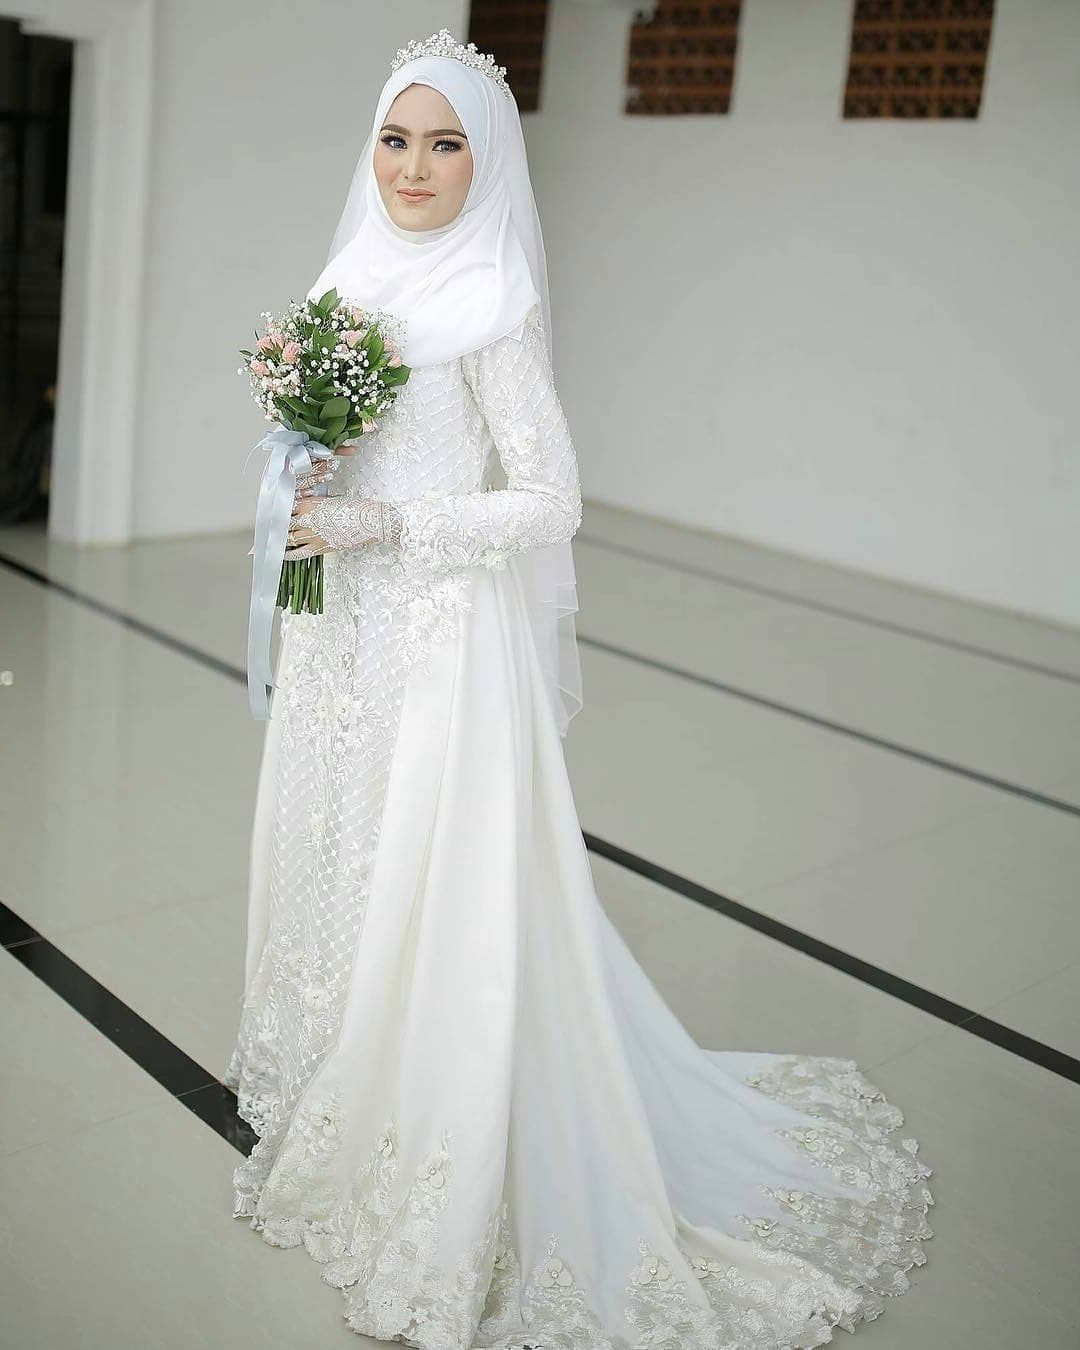 Bentuk Baju Gamis Pernikahan U3dh Celeste Eng Celesteeng On Pinterest